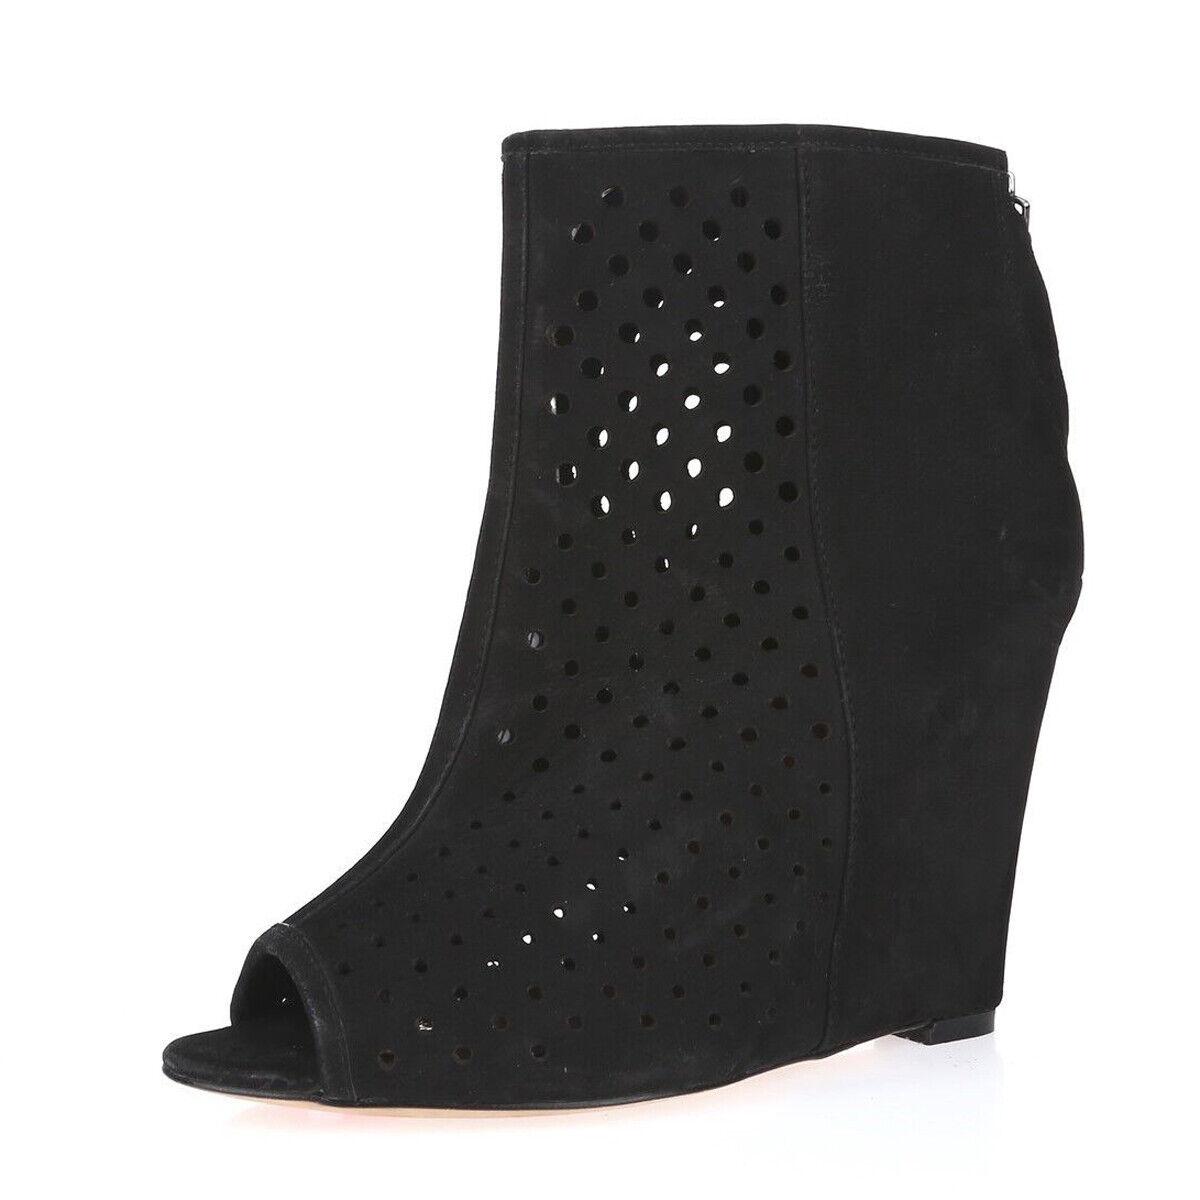 REBECCA MINKOFF Women's Sienna Black Perforated Wedge Booties Sz 8  295 NIB